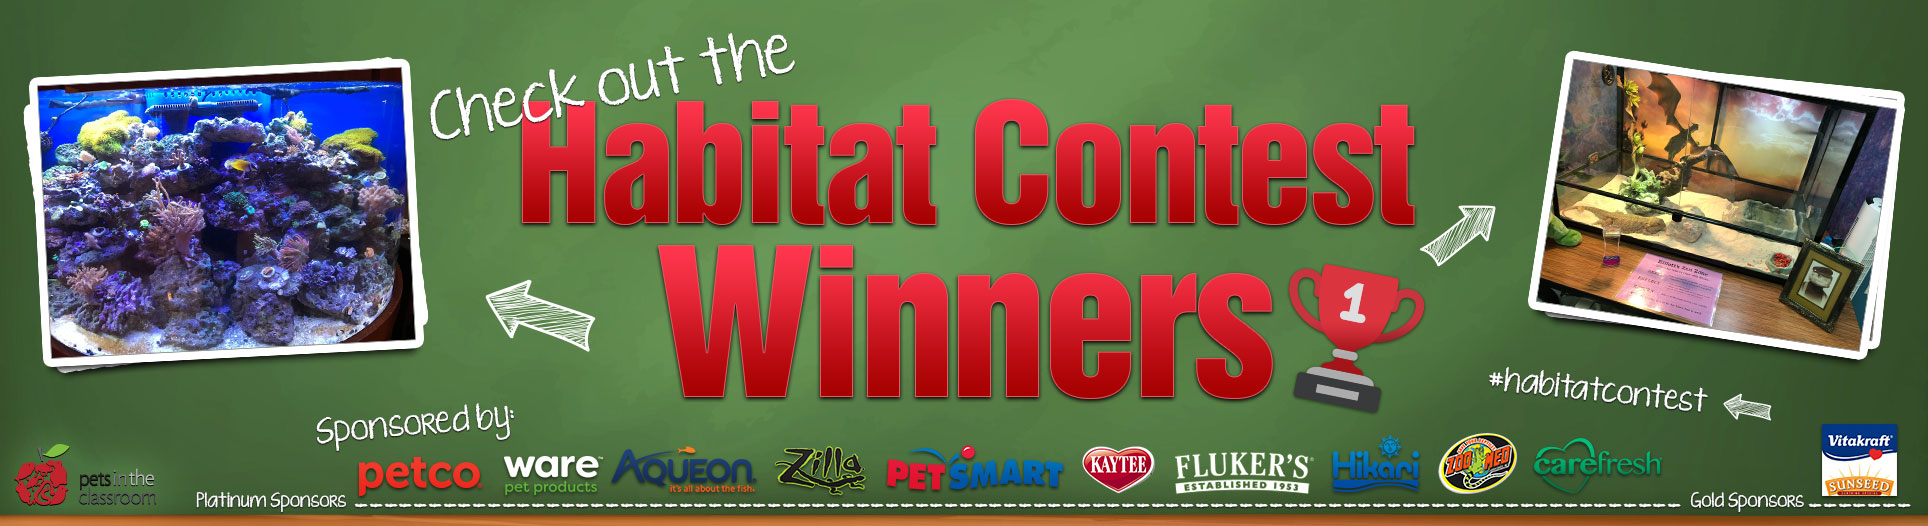 Habitat Contest Winners 2019